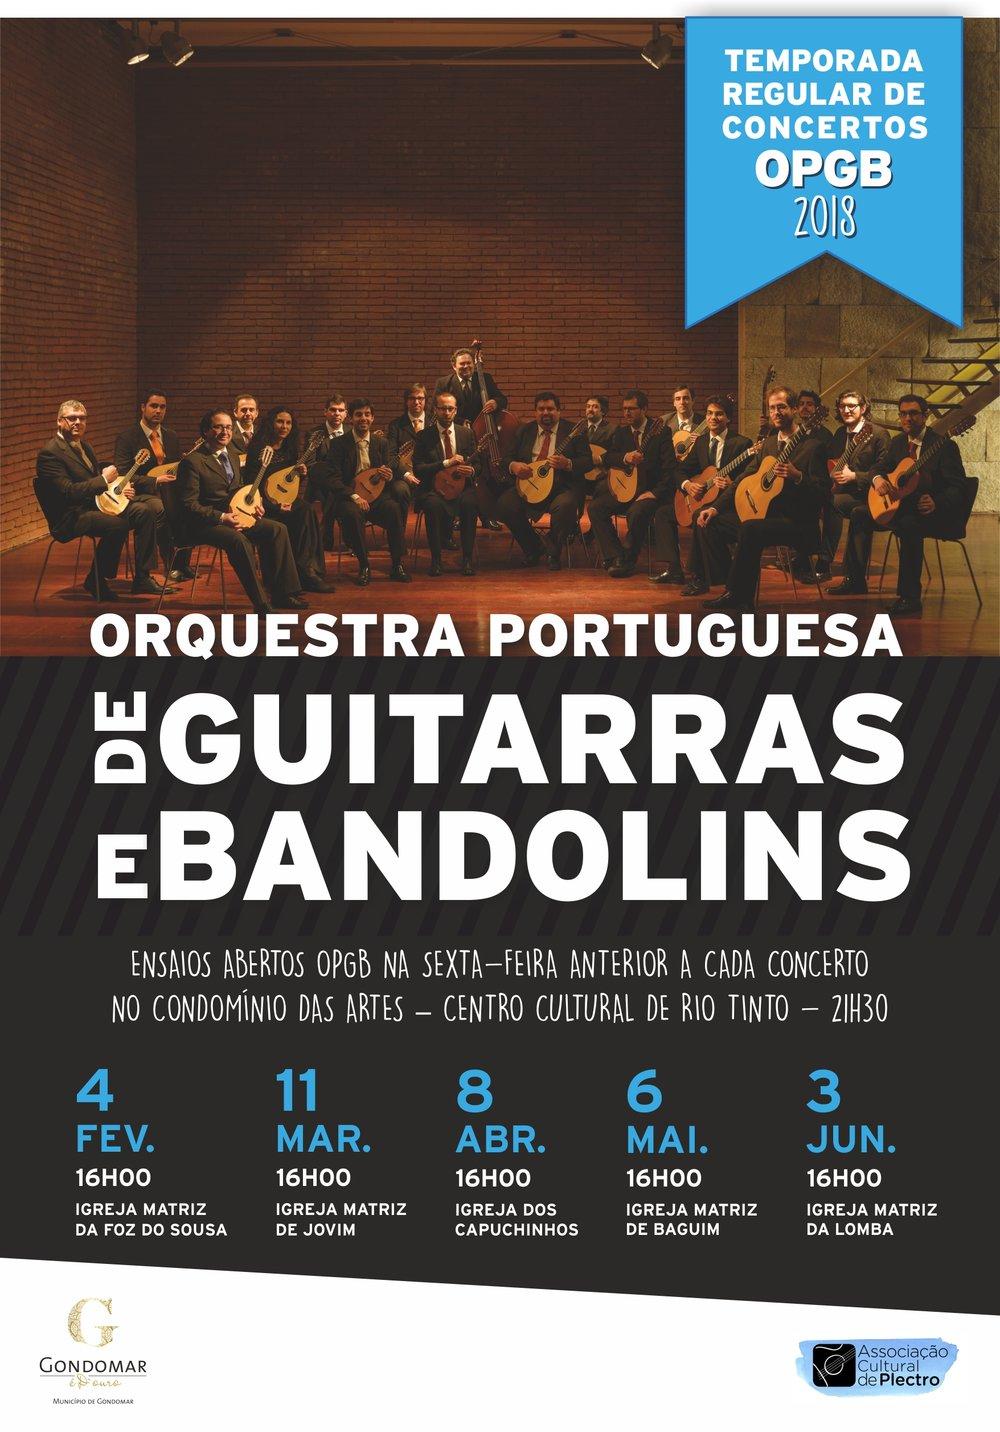 Cartaz Temporada Regular de Concertos OPGB 2018_todos.jpg